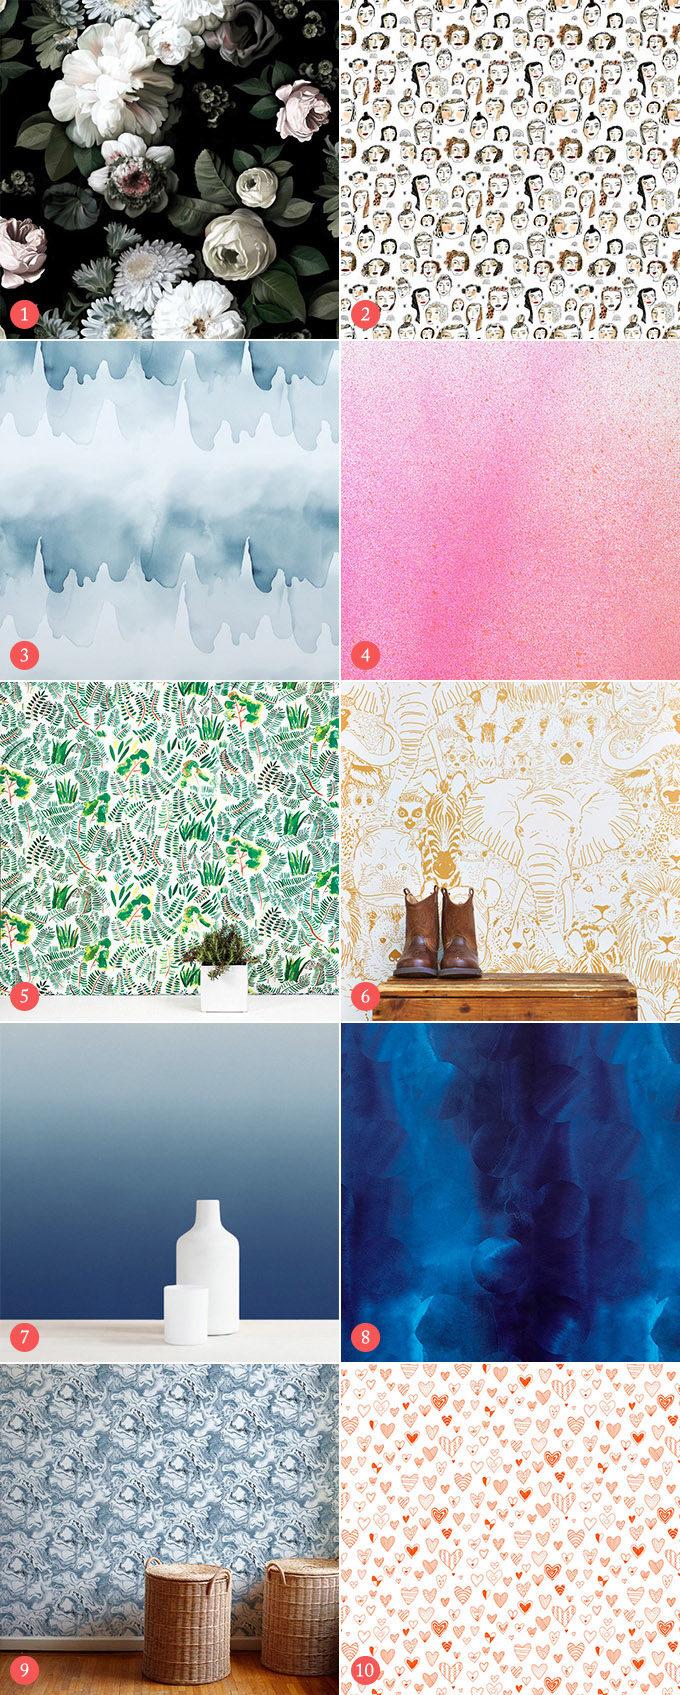 wallpaper-best-floral-pattern